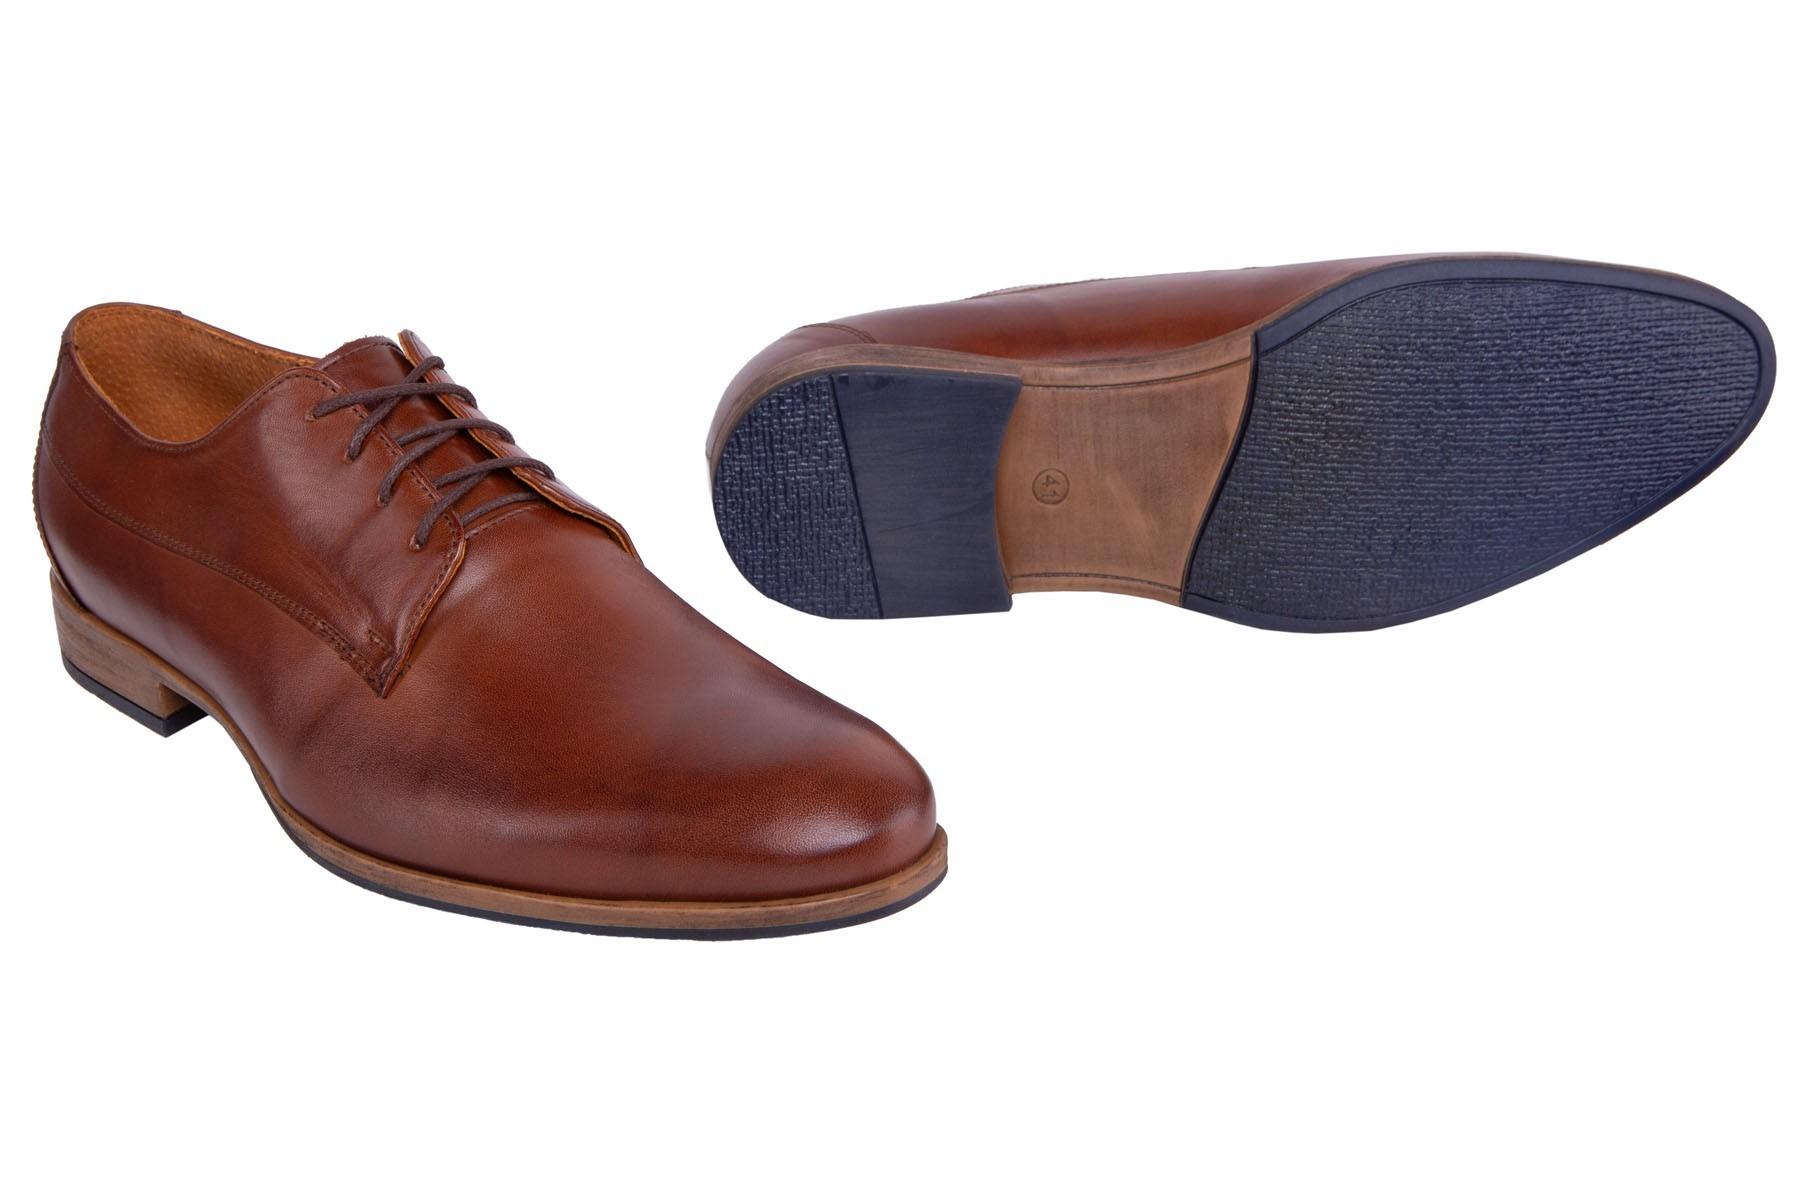 Brązowe klasyczne buty męskie do garnituru ze skóry naturalnej.